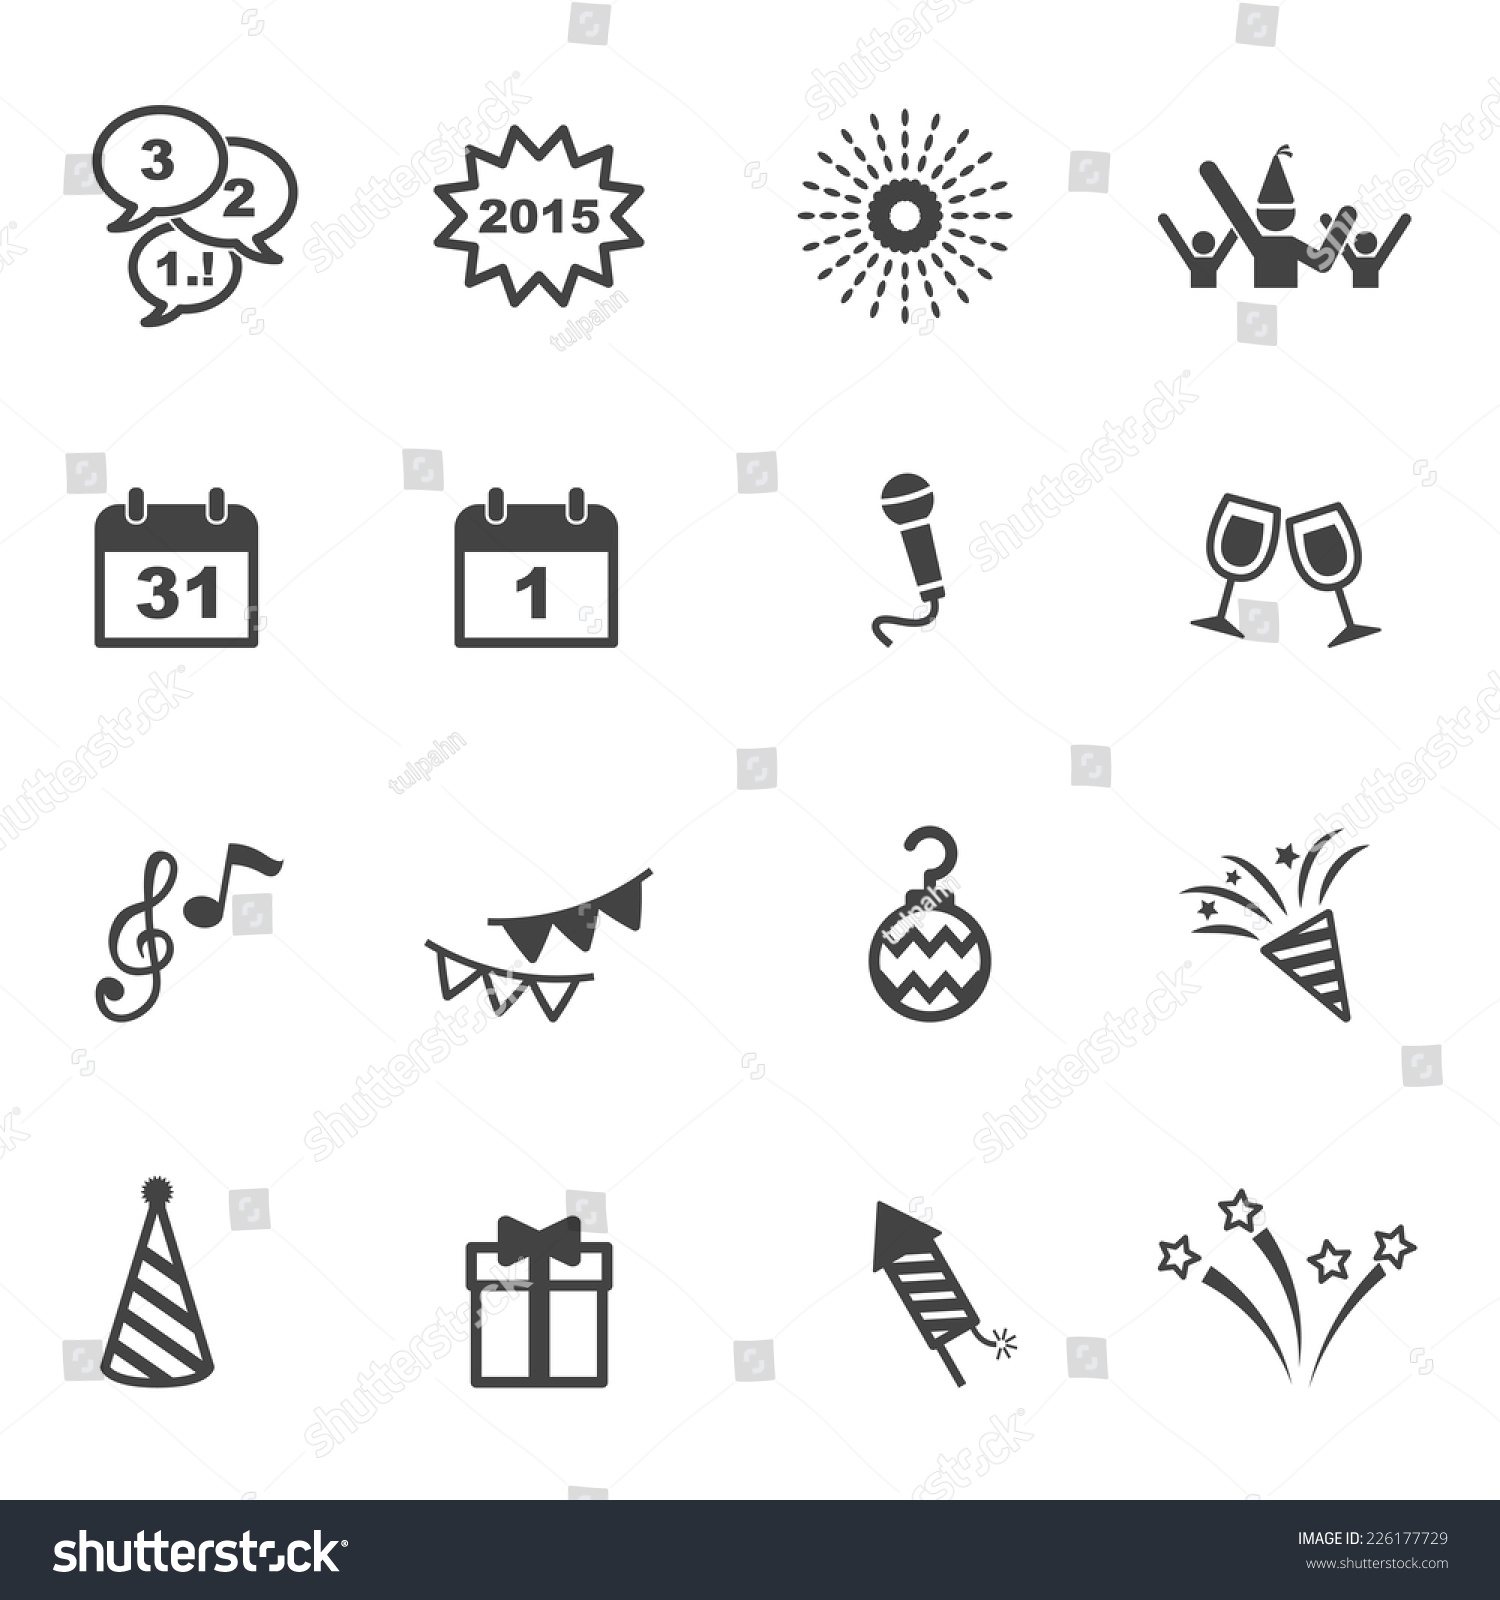 Happy New Year Icons Mono Vector Stock Vector 226177729 Shutterstock